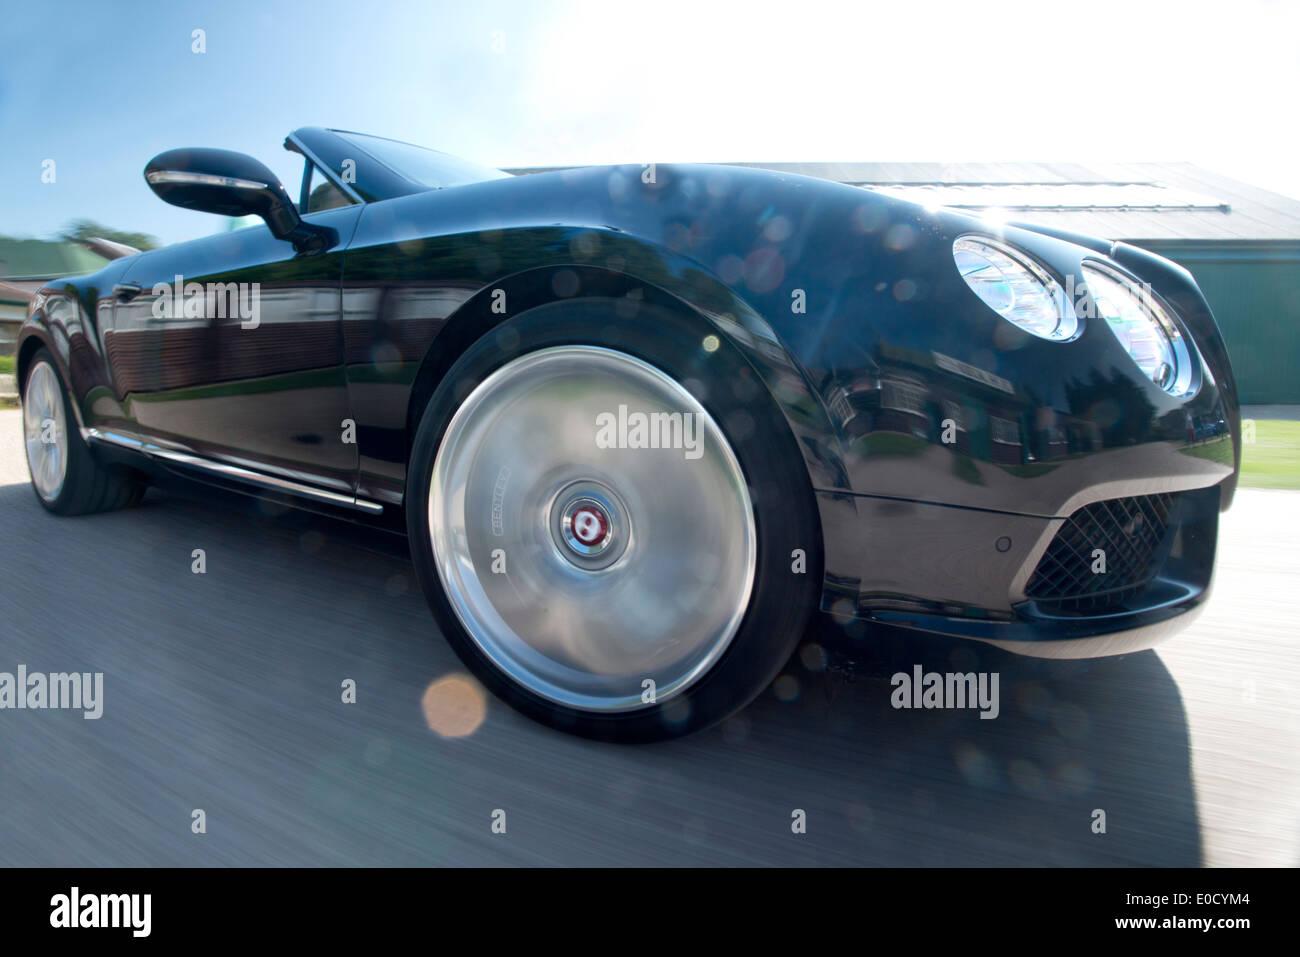 pole mount rig action shot of 2013 Bentley GTC luxury British convertible car - Stock Image